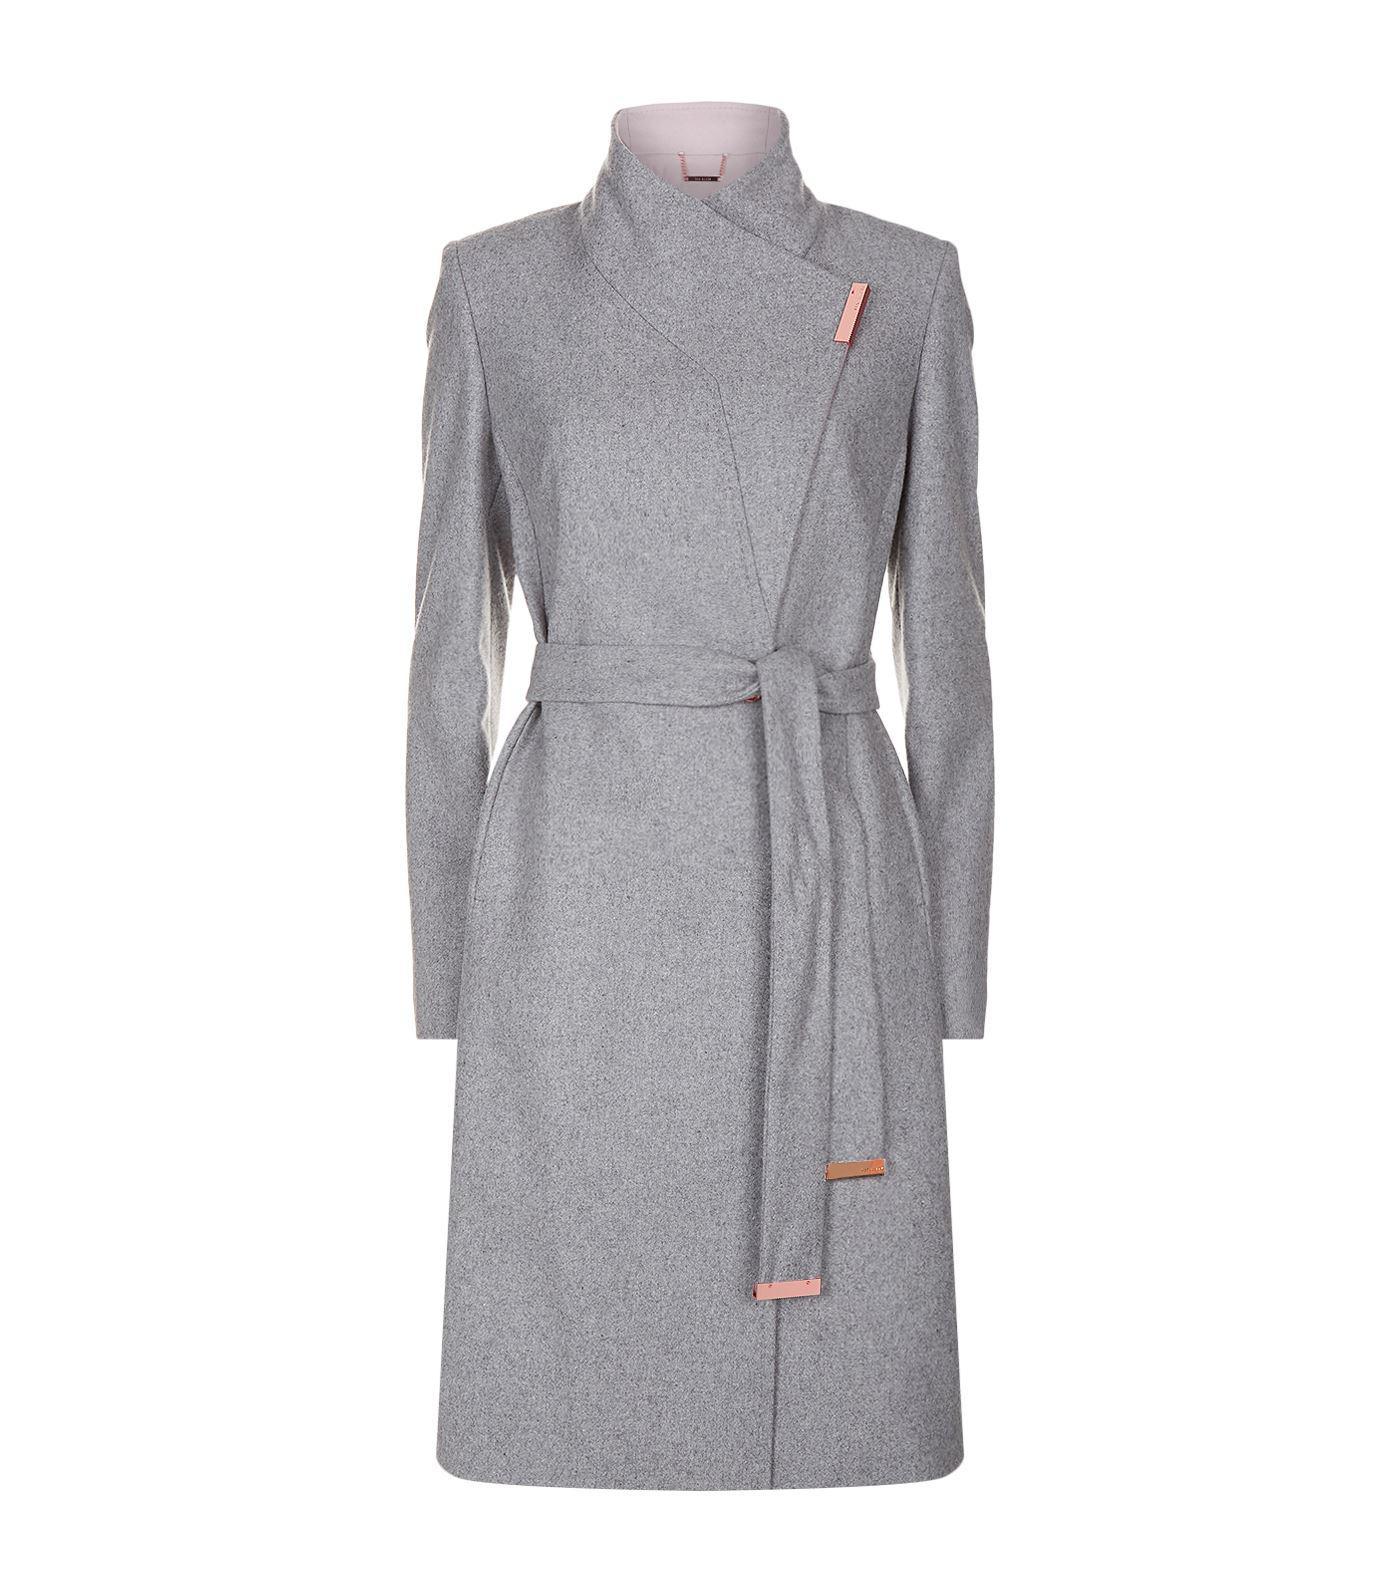 4c9c675eacd4 Lyst - Ted Baker Khera Wrap Coat in Gray